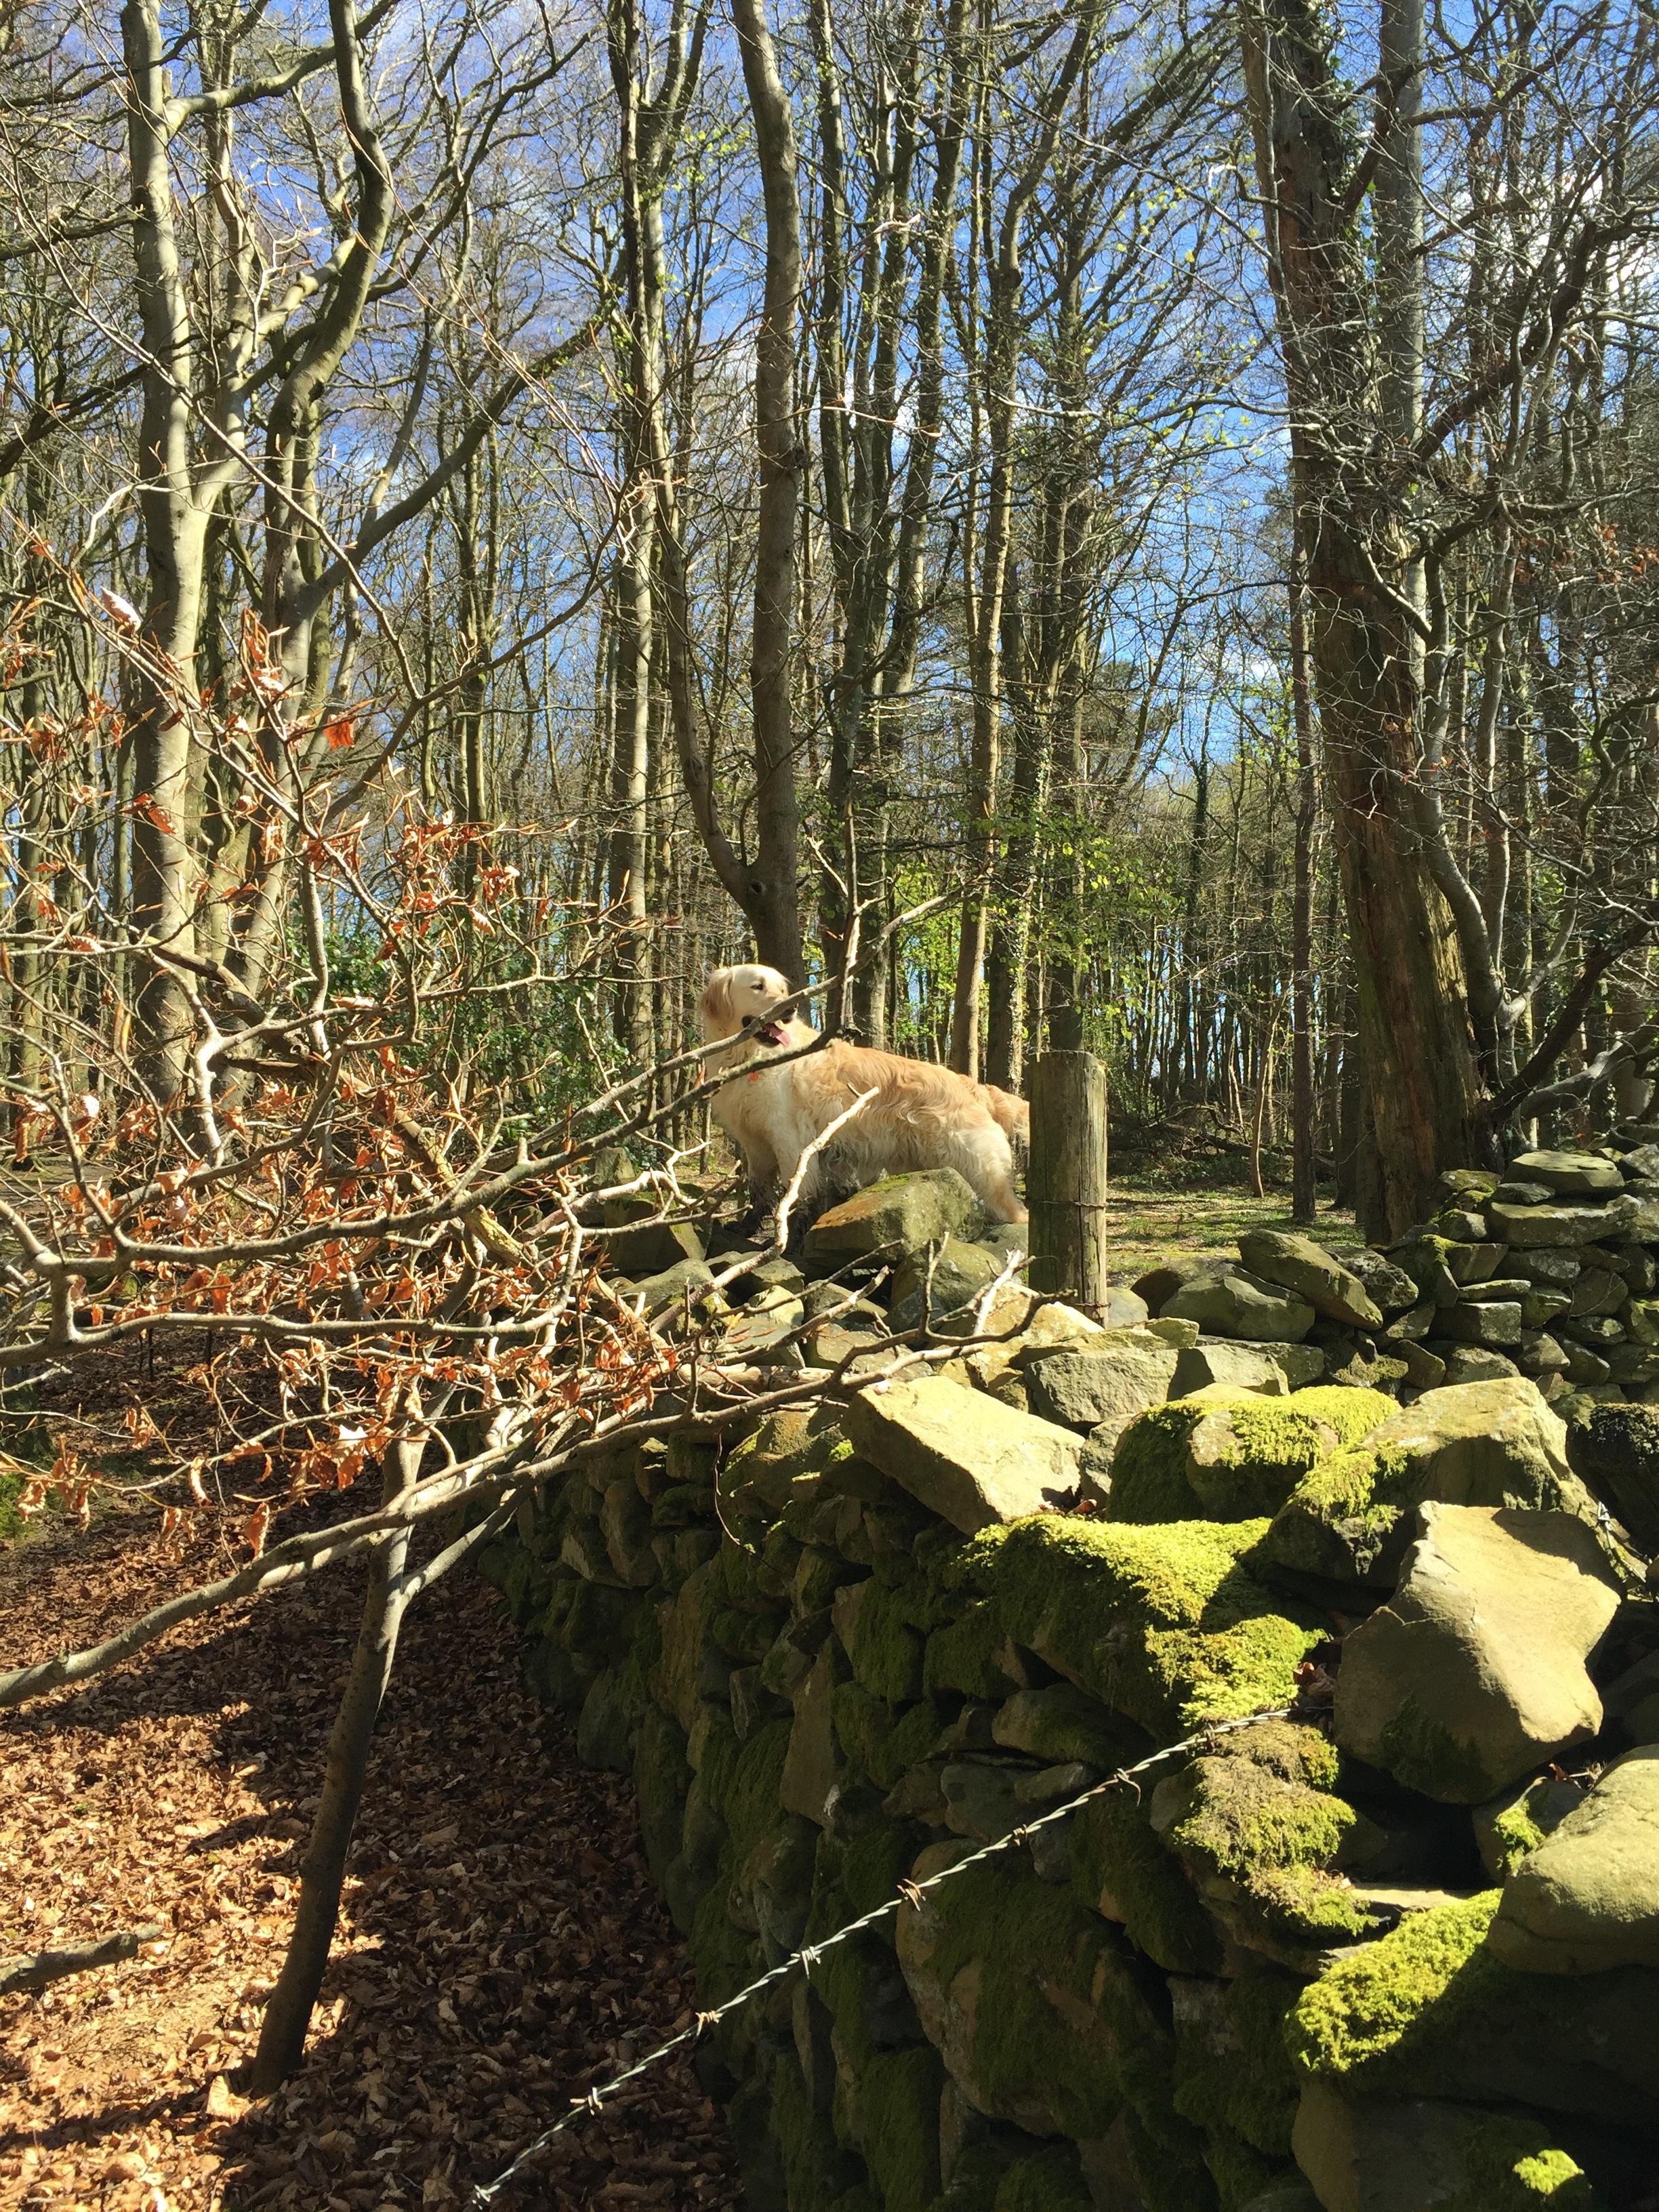 dog_wall_golden_retriver_helens_bay_to_crawfordsburn_roadtrip_coast_ni_explorer_niexplorer_northern_ireland_blog.jpg